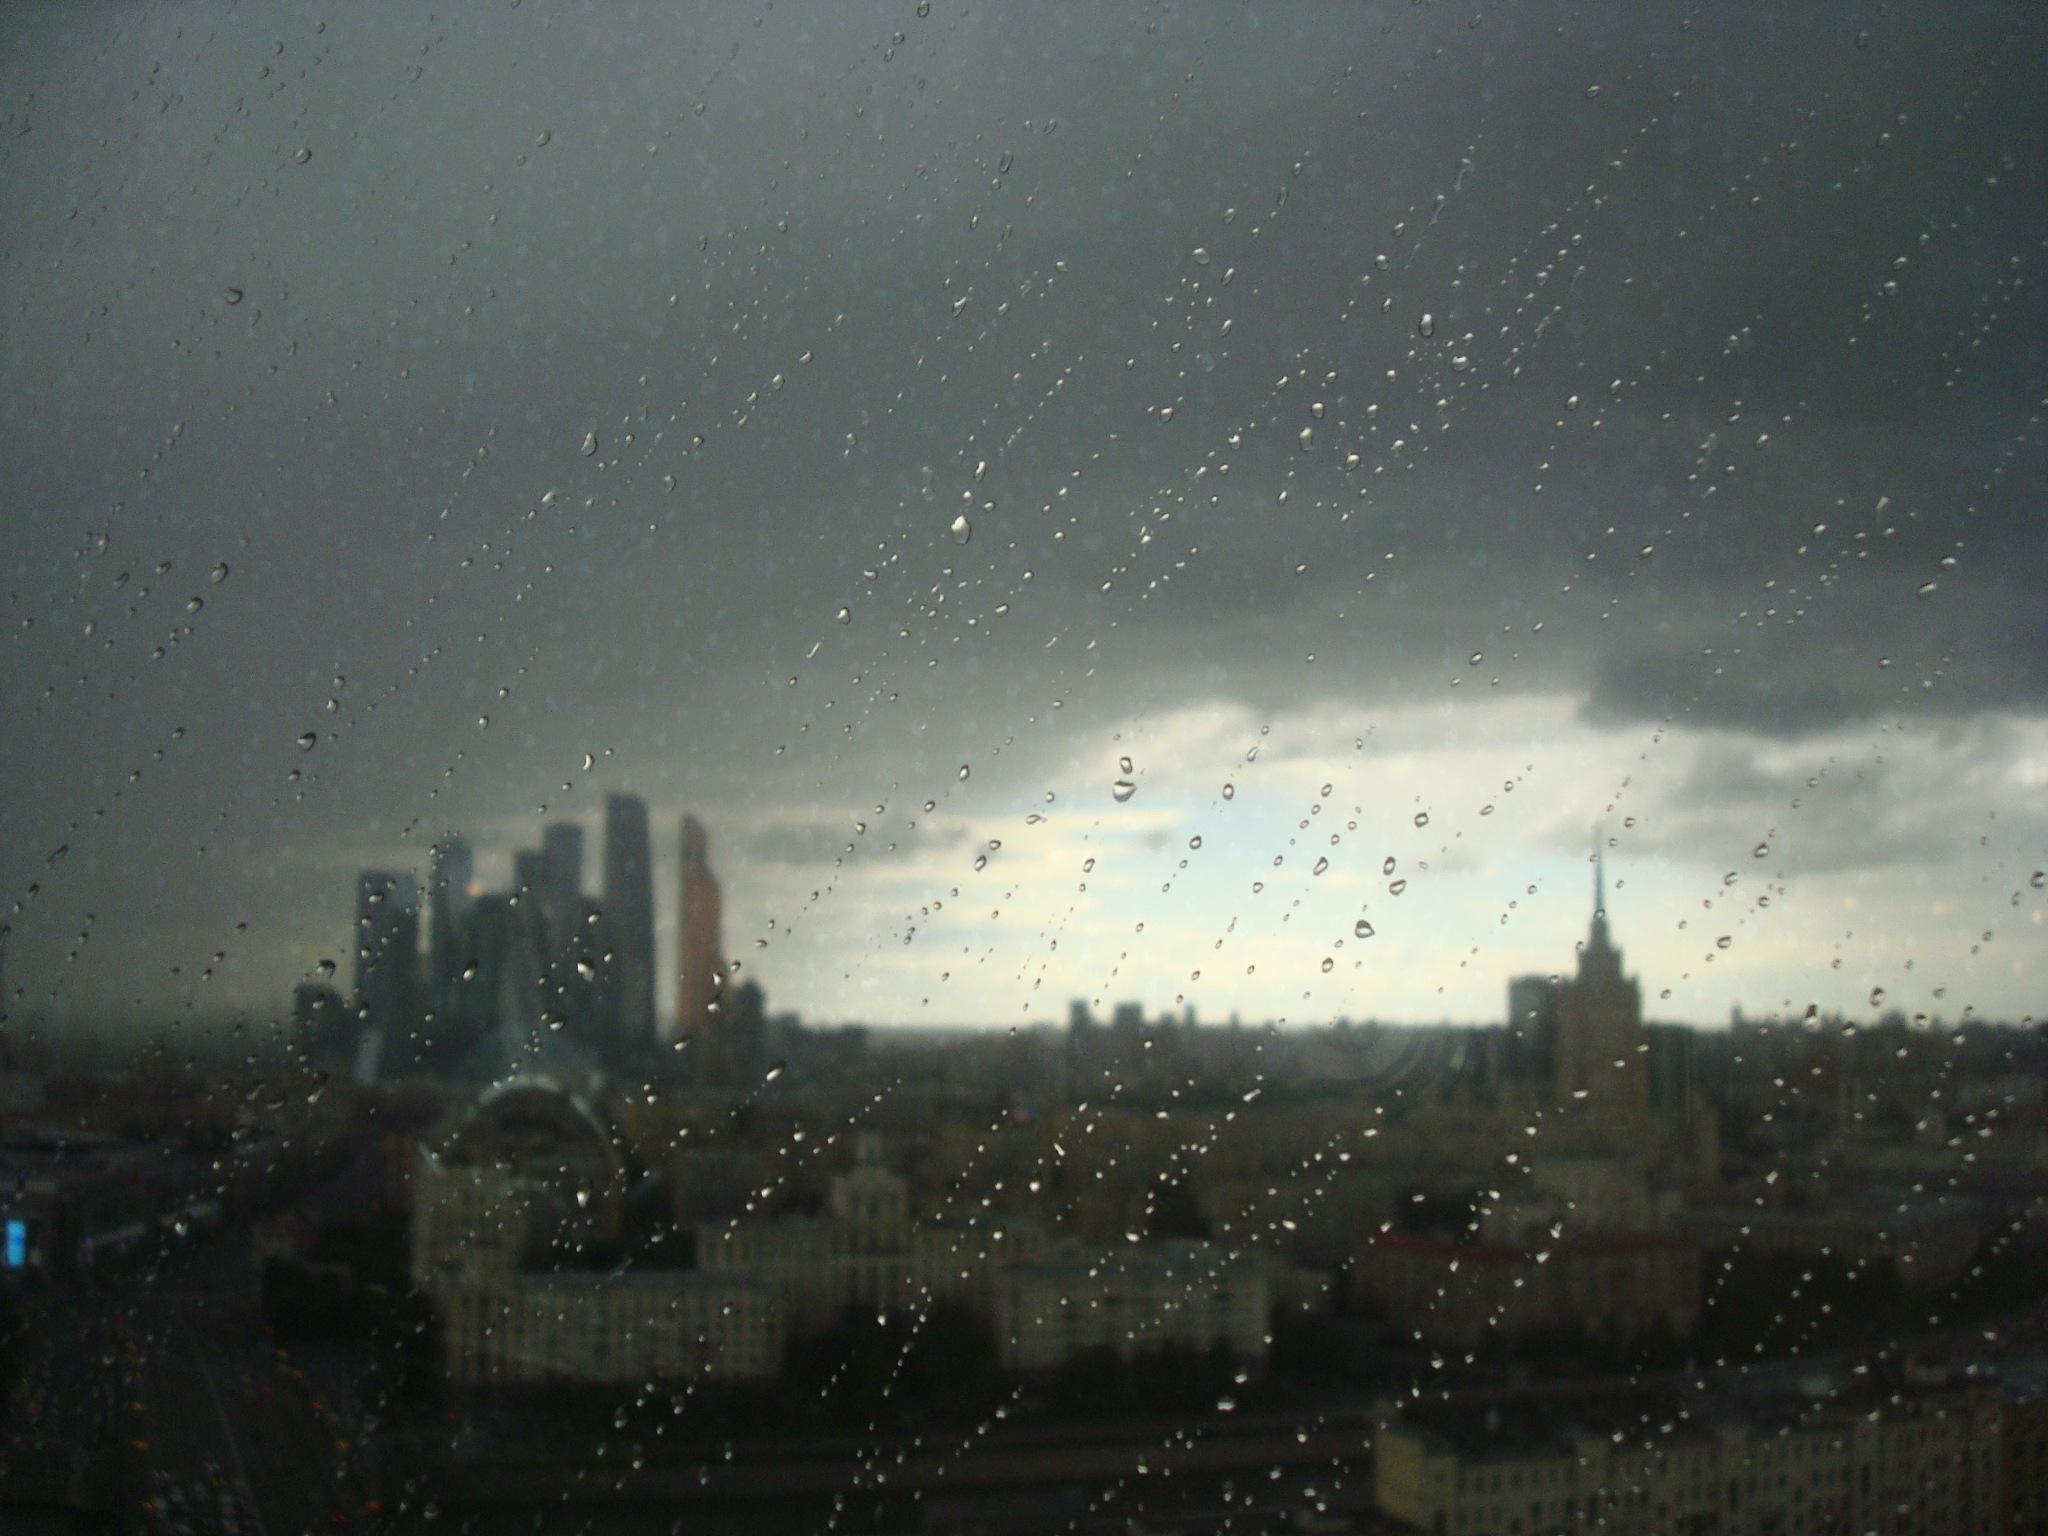 Rain on the window by SVK